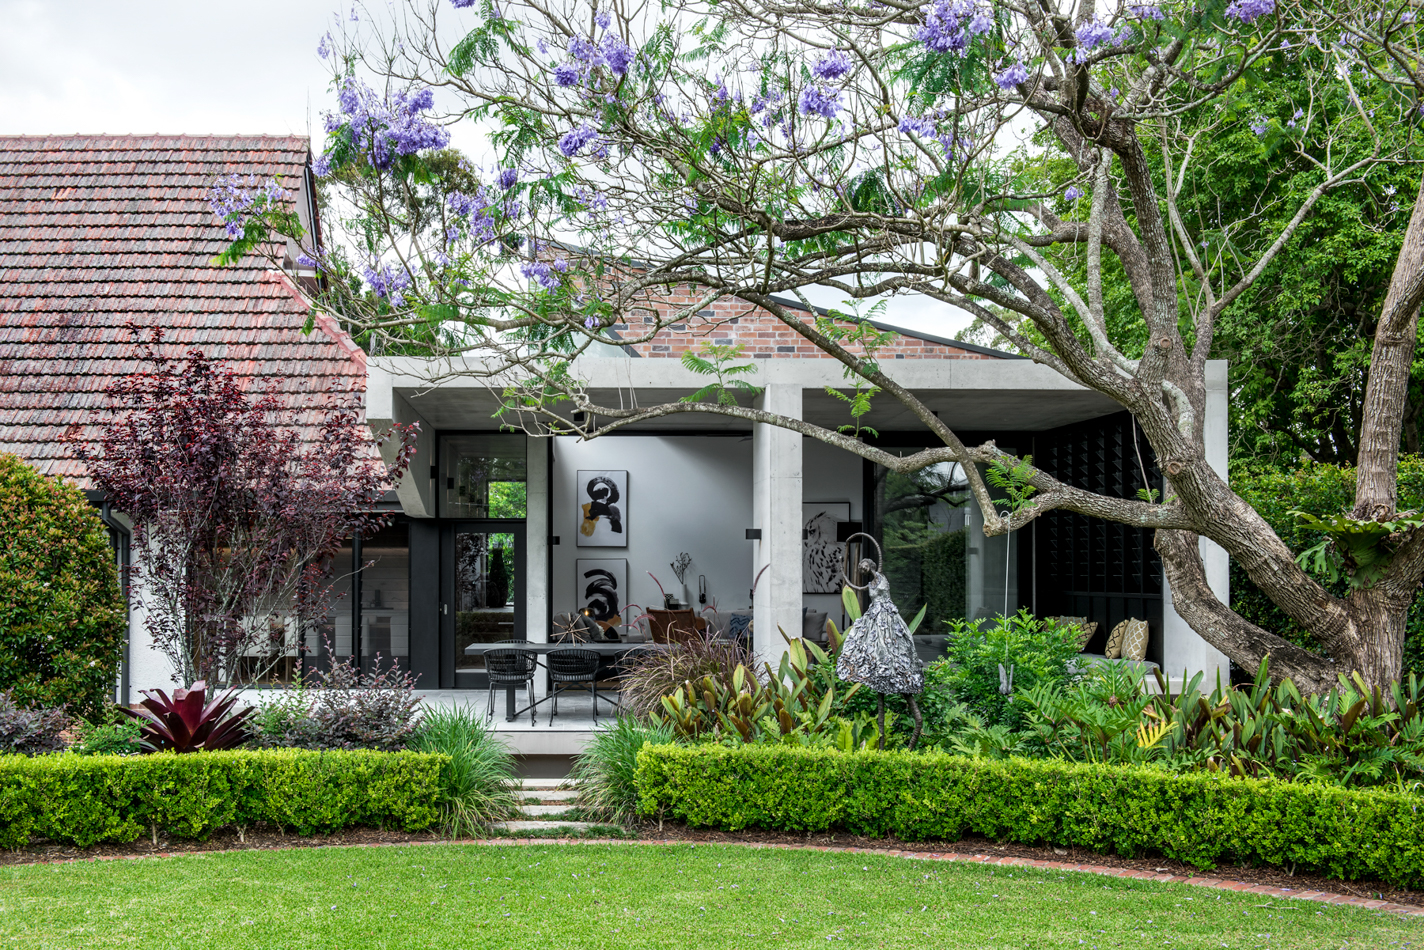 the-terrace-shaun-lockyer-architects-the-design-emotive-9.jpg